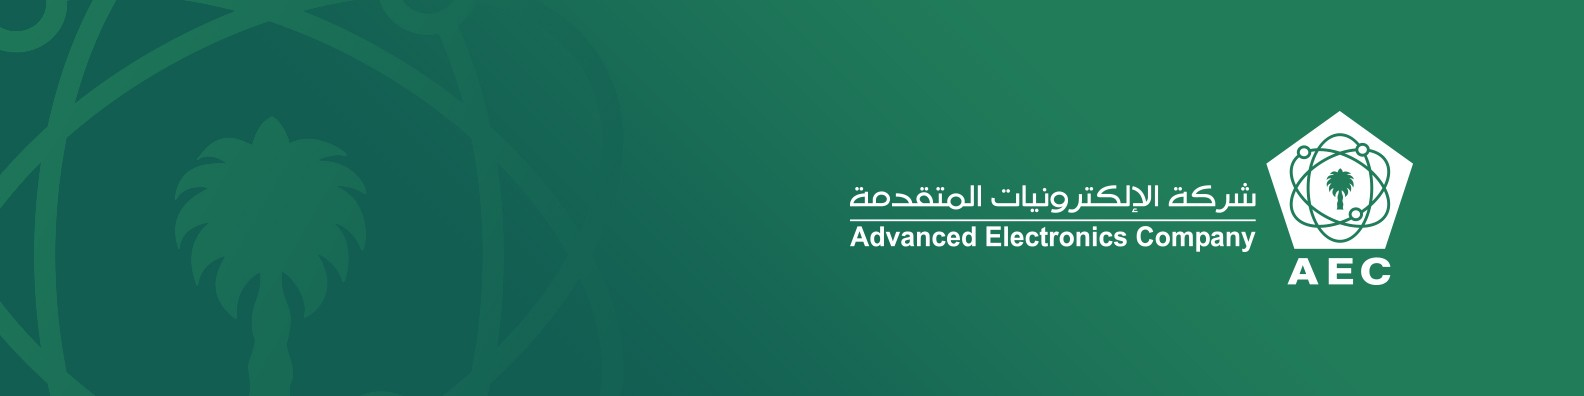 Advanced Electronics Company | LinkedIn